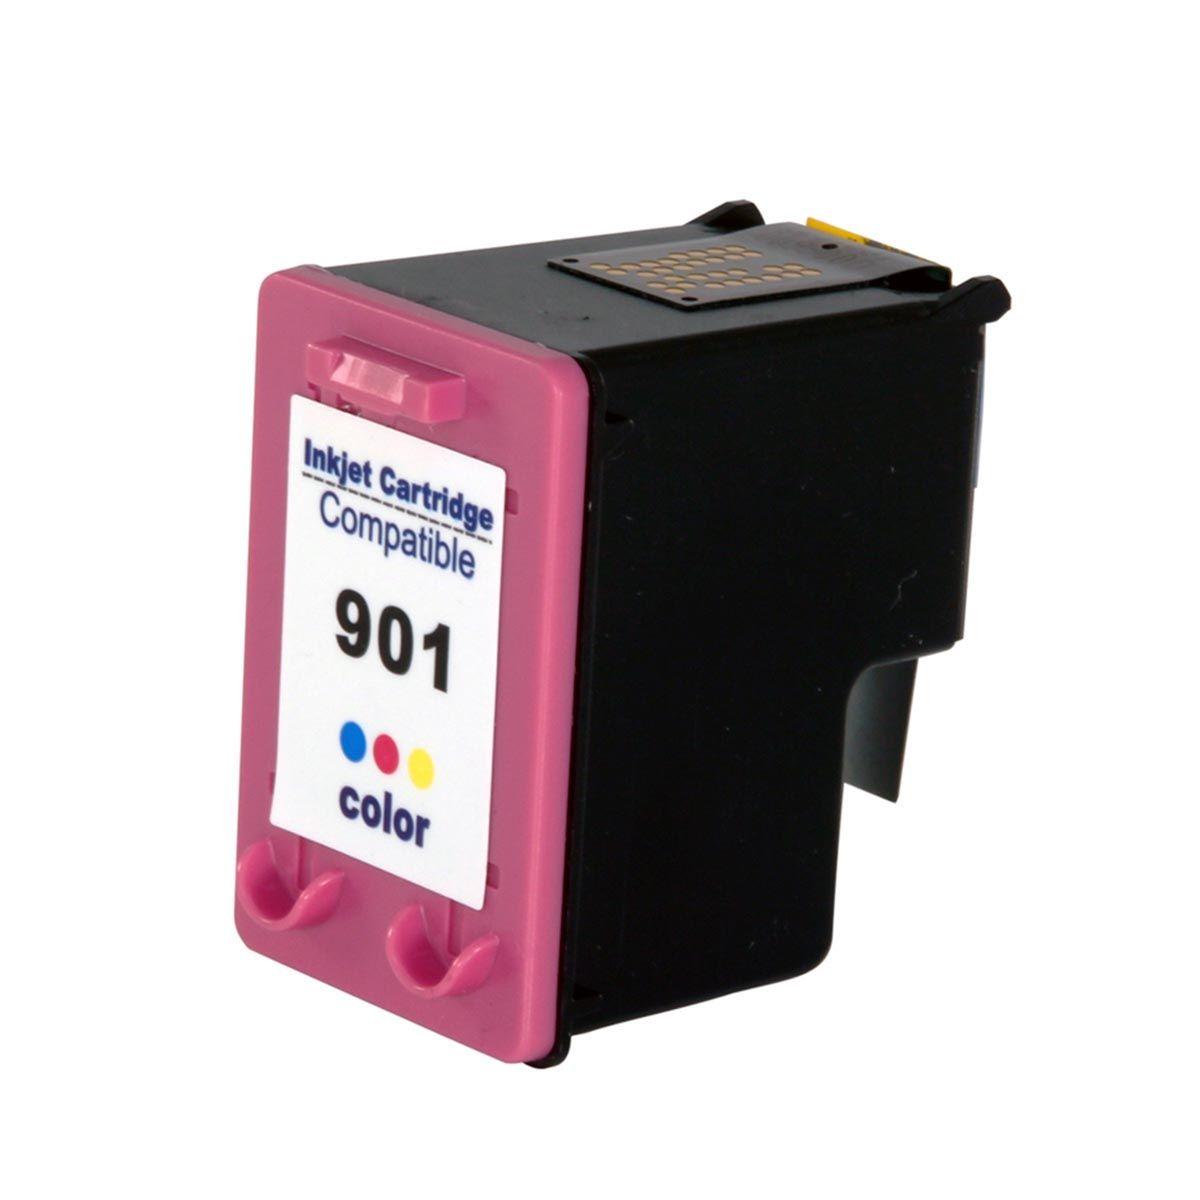 CARTUCHO DE TINTA (CC656AB) HP 901 XL  OFFICEJET J4580 J4680 J4660 J4500 J4550 COLORIDO COMPATÍVEL